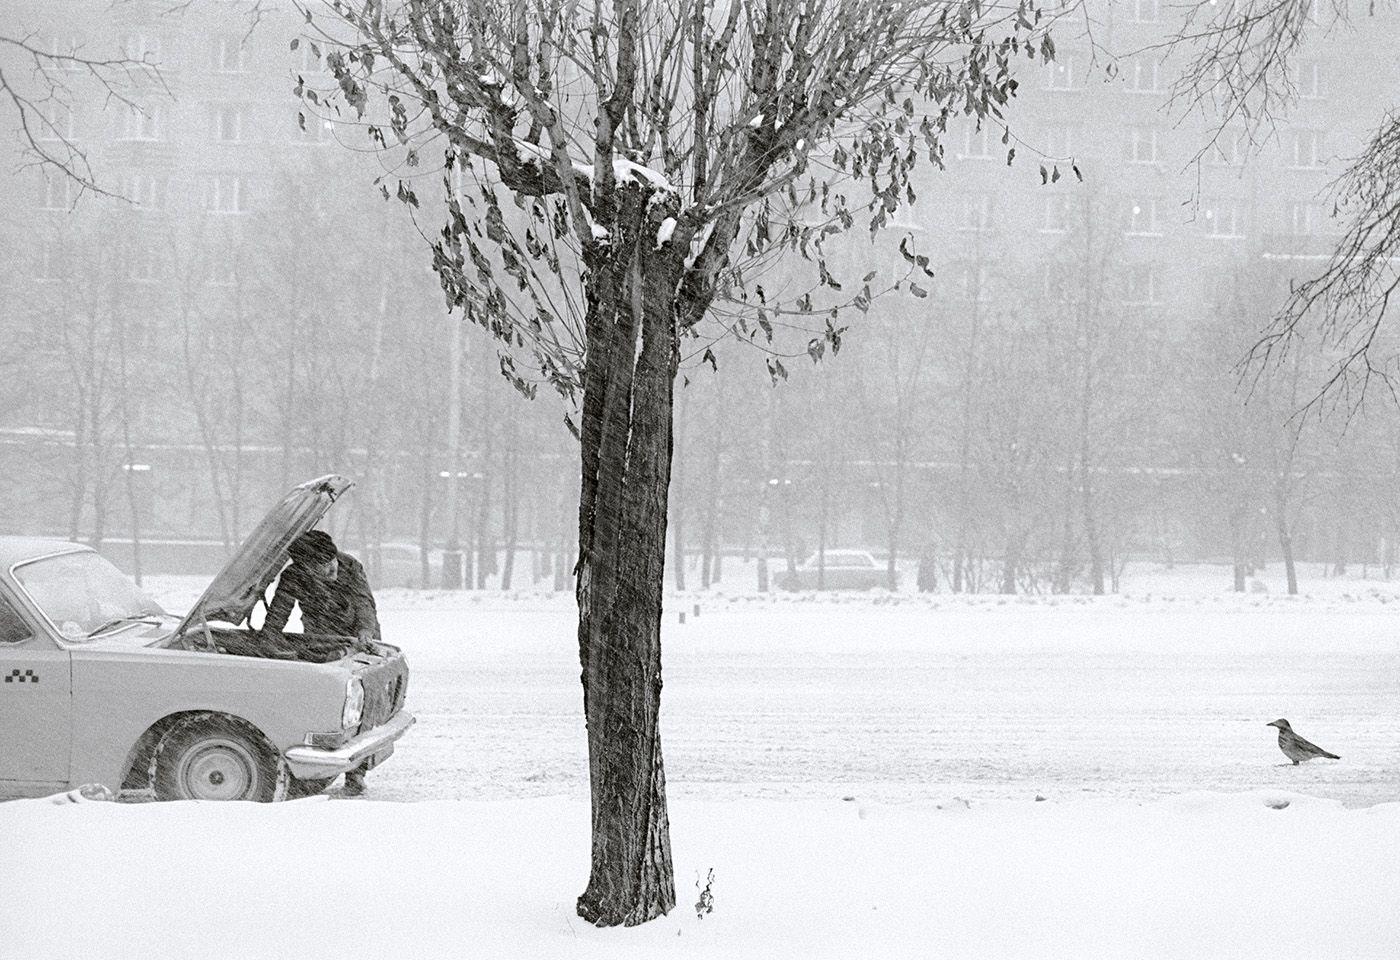 Pentti Sammallahti (b. 1950, Helsinki), Moscow, Russia, 1980